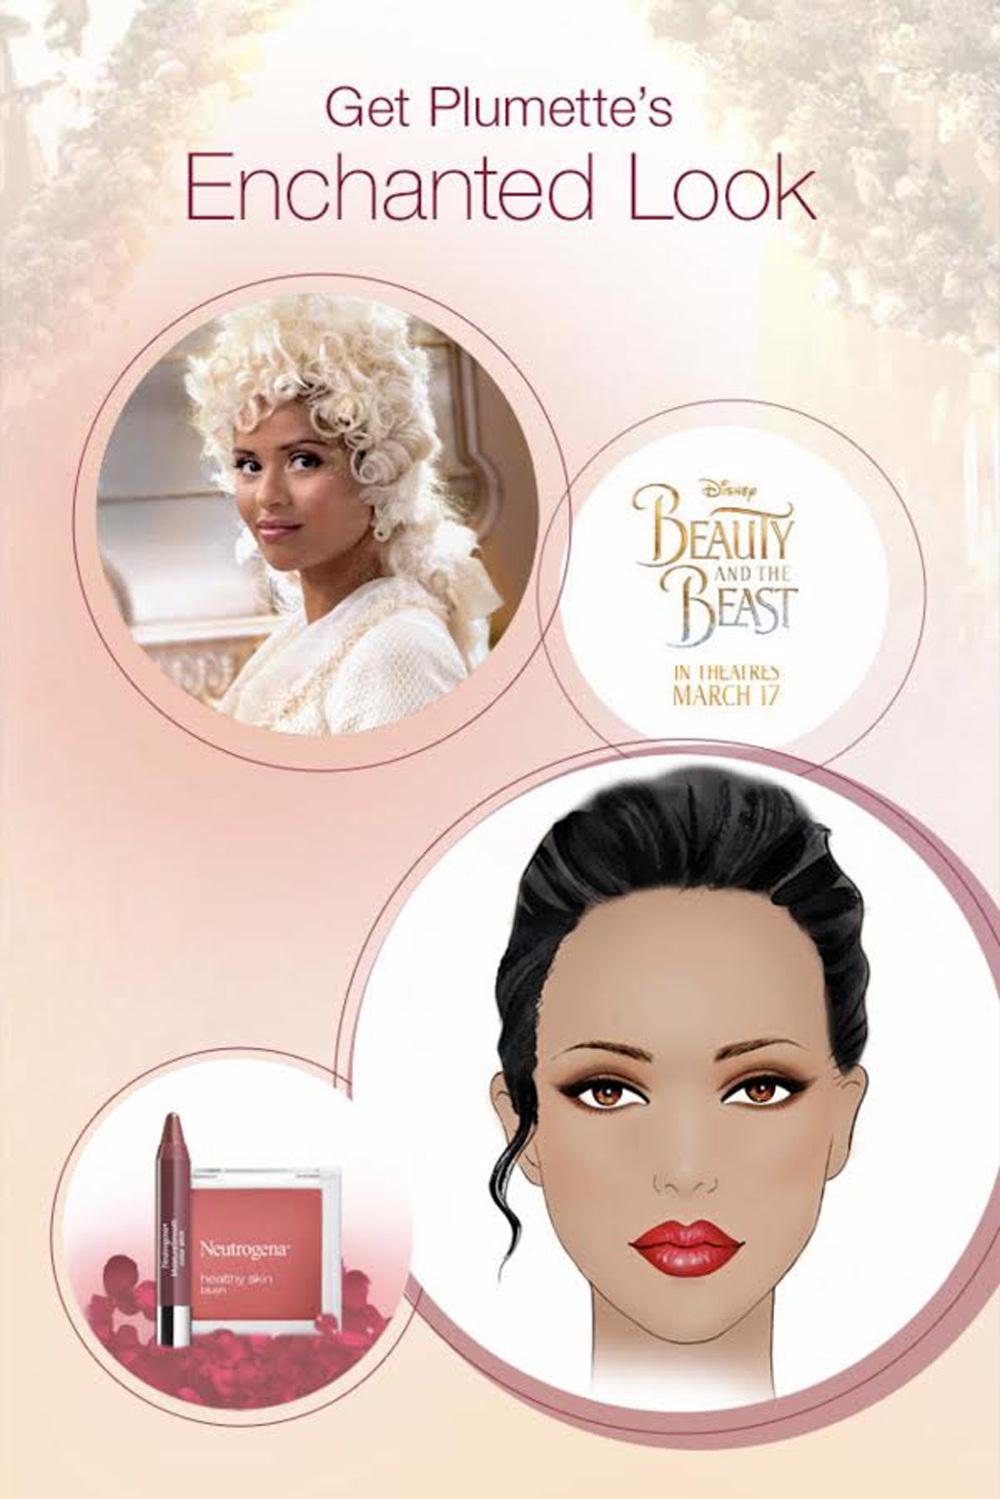 Makeup tutorials sunny gu previous next image 1 of 7 baditri Gallery